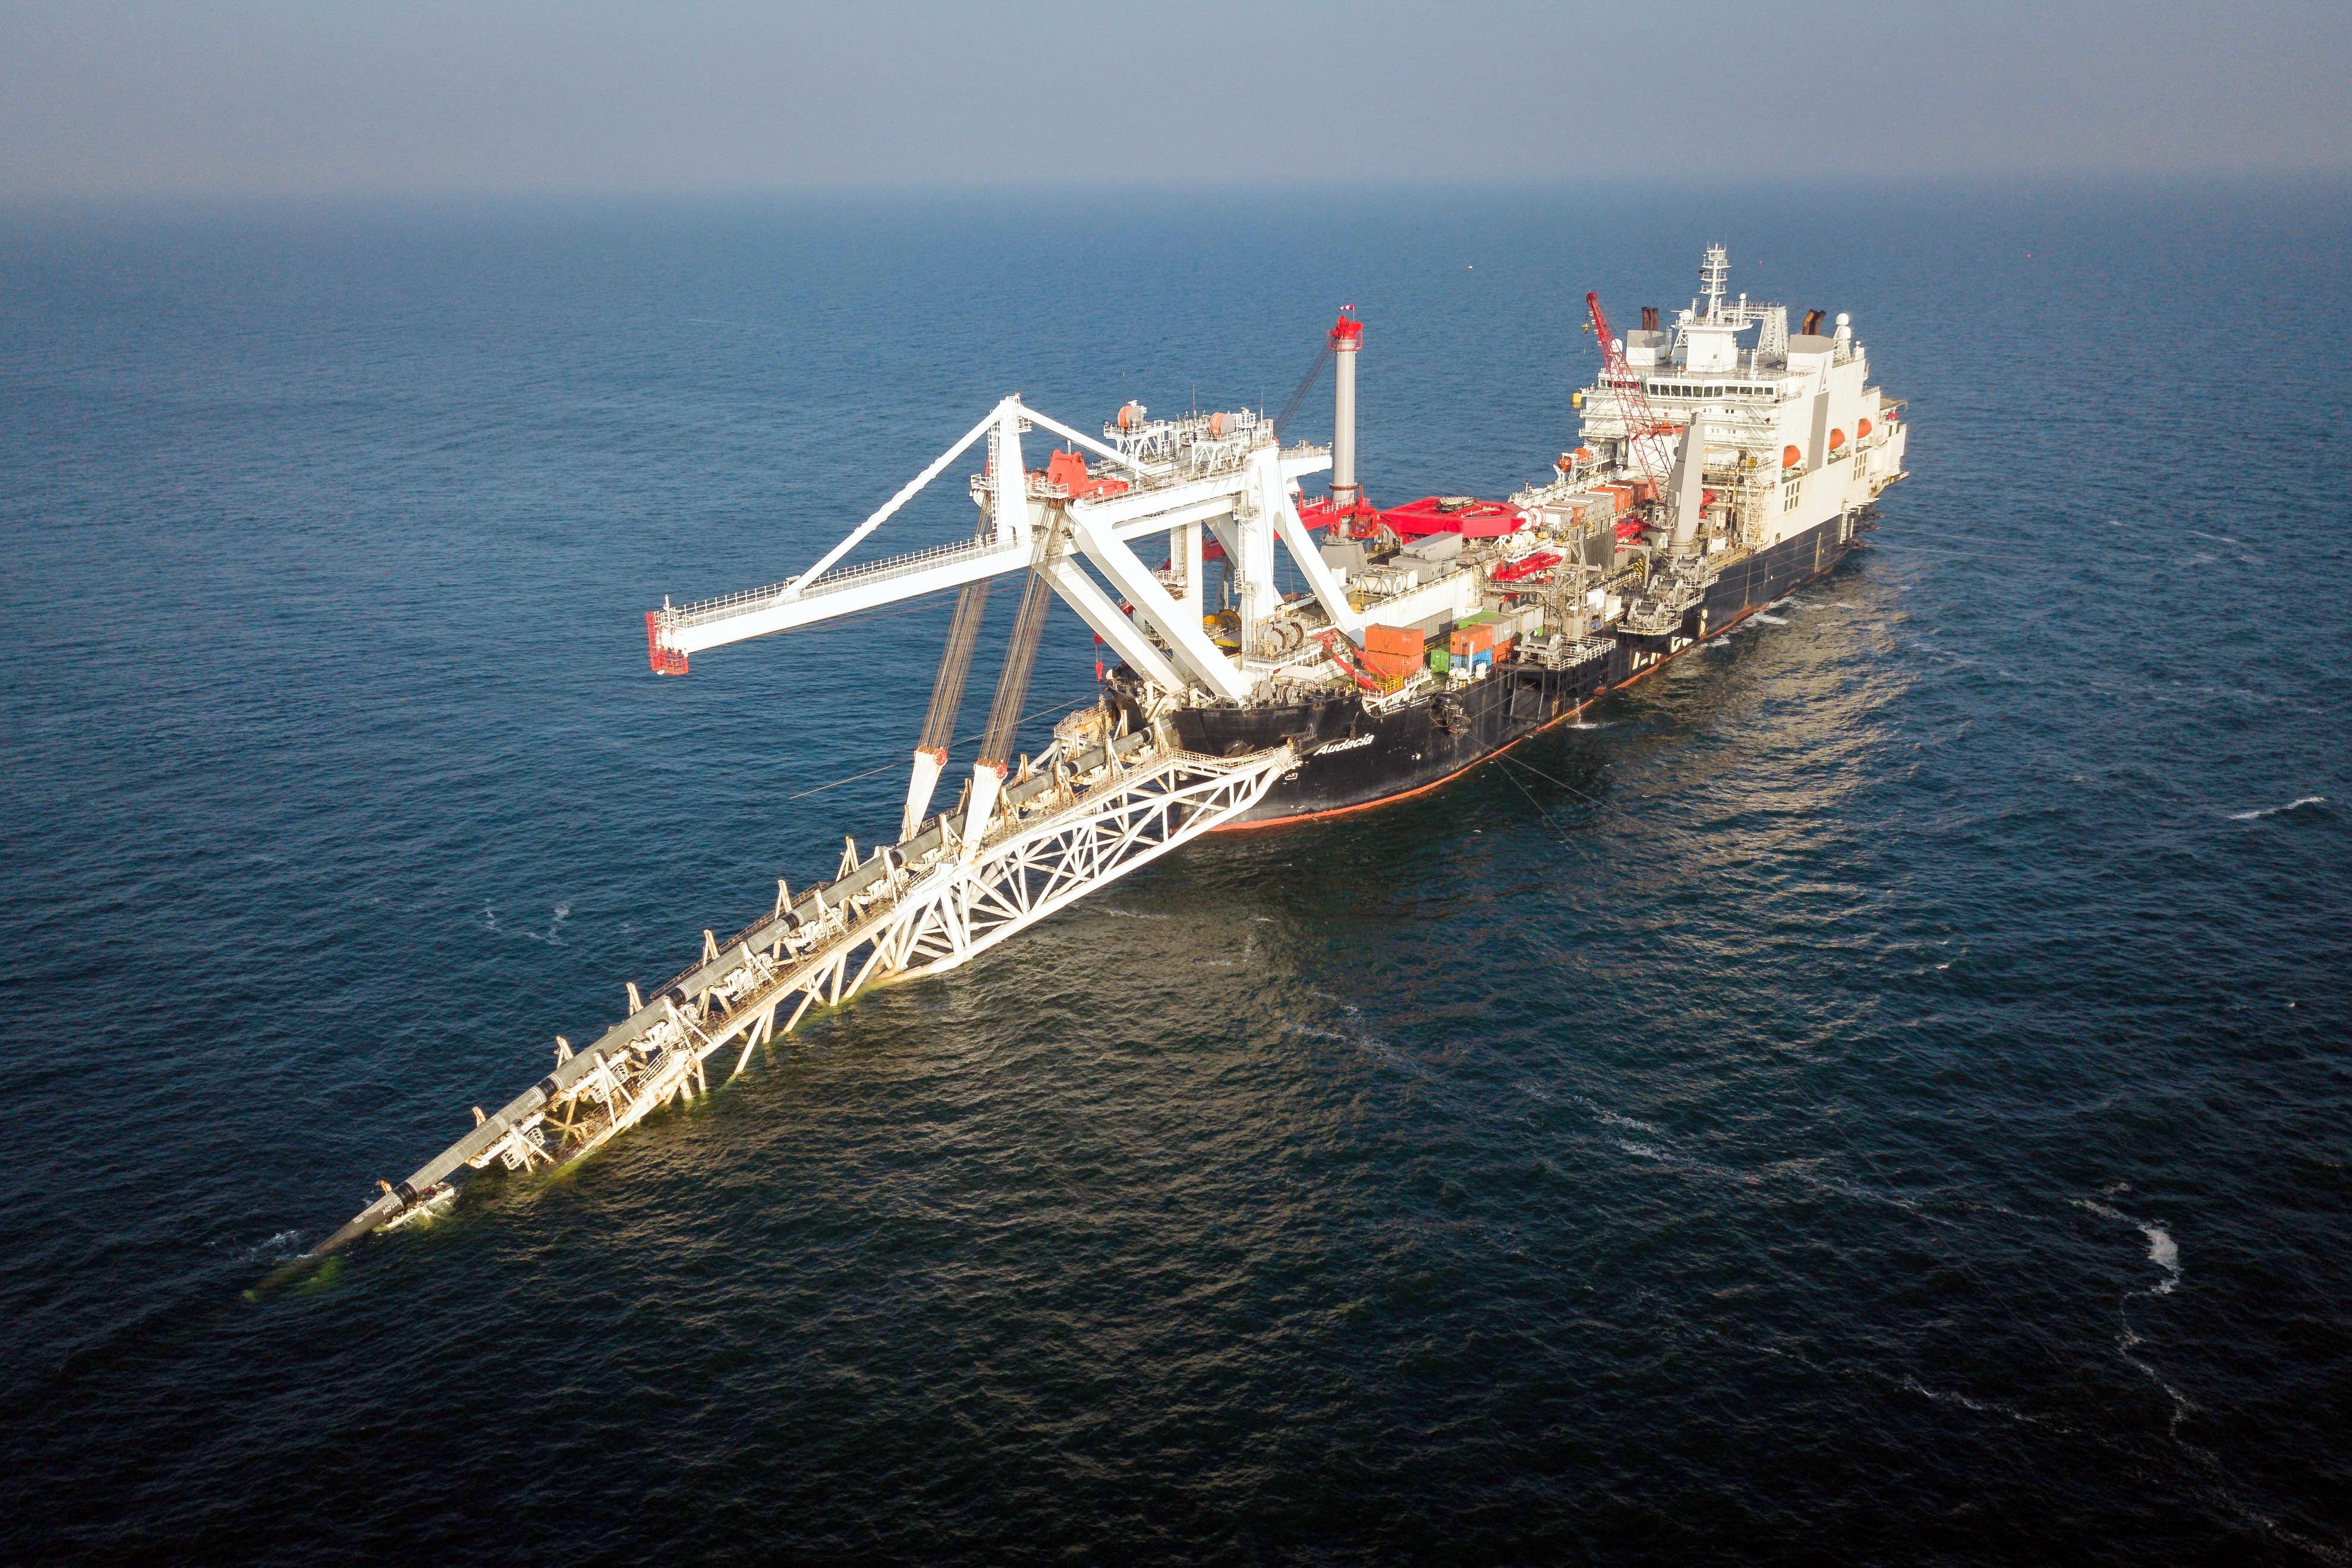 "<p>Укладка газопровода втерриториальных водах Германии. Фото © <a href=""http://www.gazprom.ru/projects/nord-stream2/"" target=""_self"">Официальный сайт ""Газпрома""</a></p>"